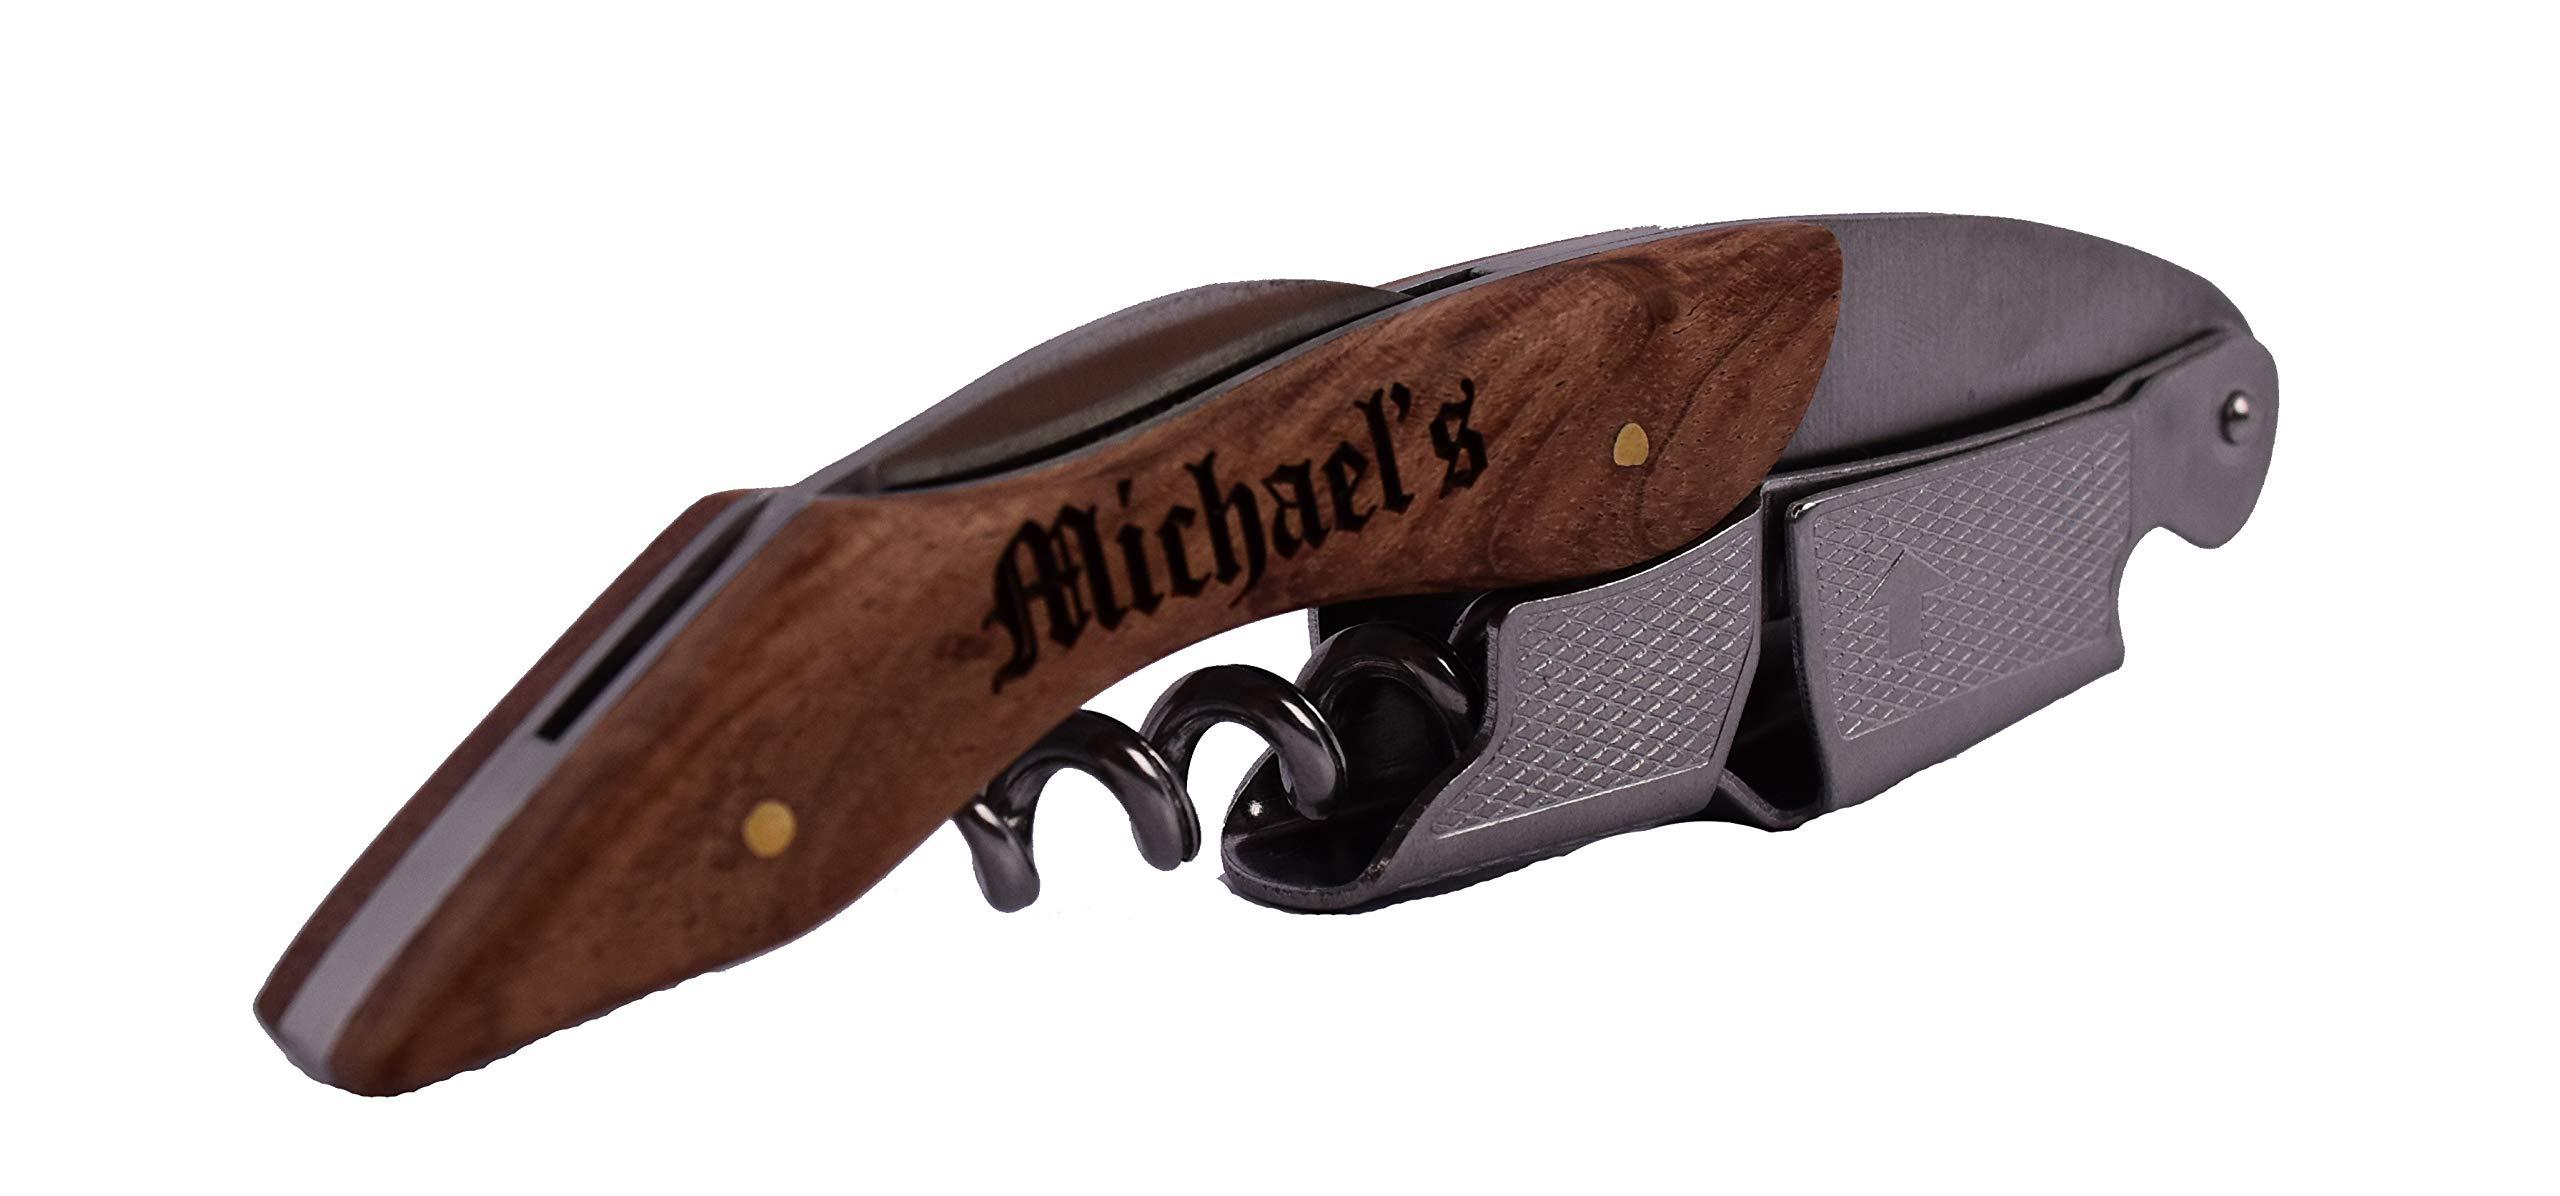 Personalized | Customized Corkscrew & Multi-Tool